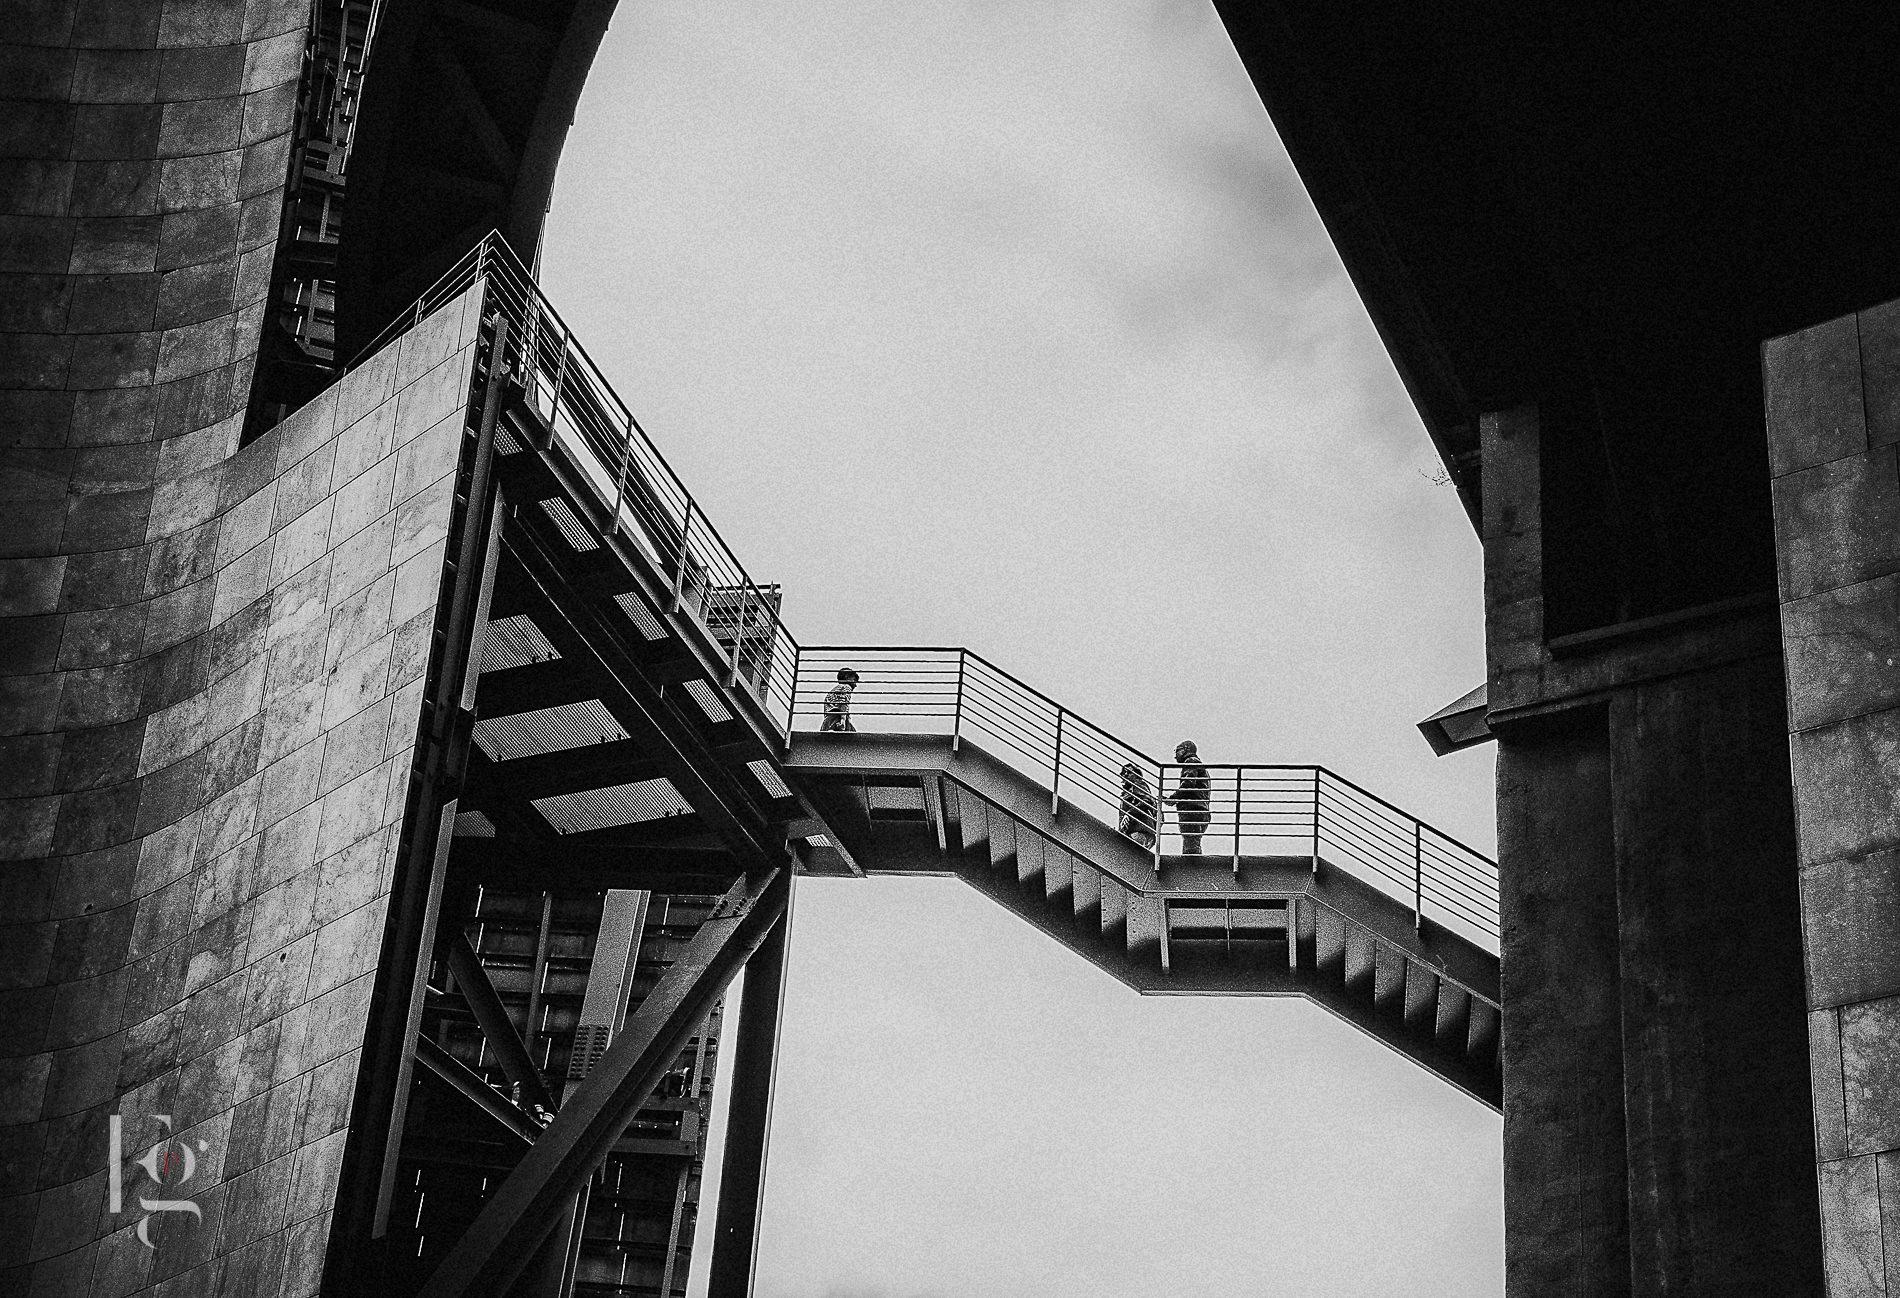 Fotografo-FedeGrau-Stairsway_to_heaven-01.jpg